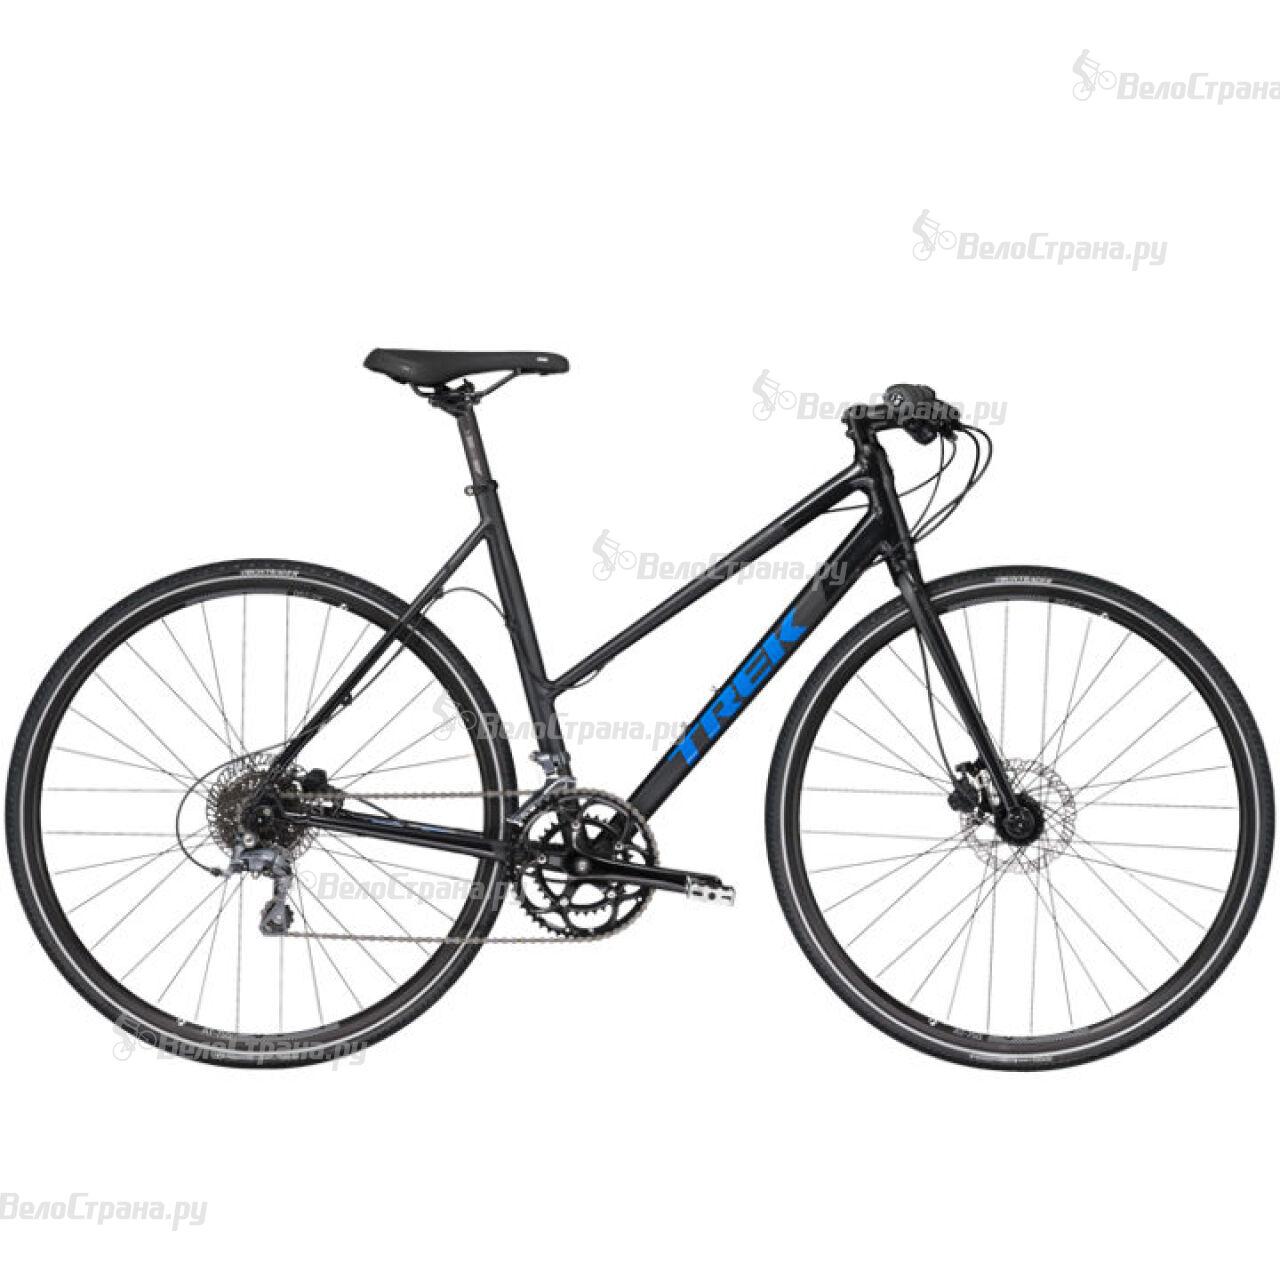 Велосипед Trek ZEKTOR 2 STAGGER (2017) велосипед trek fx stagger 2017